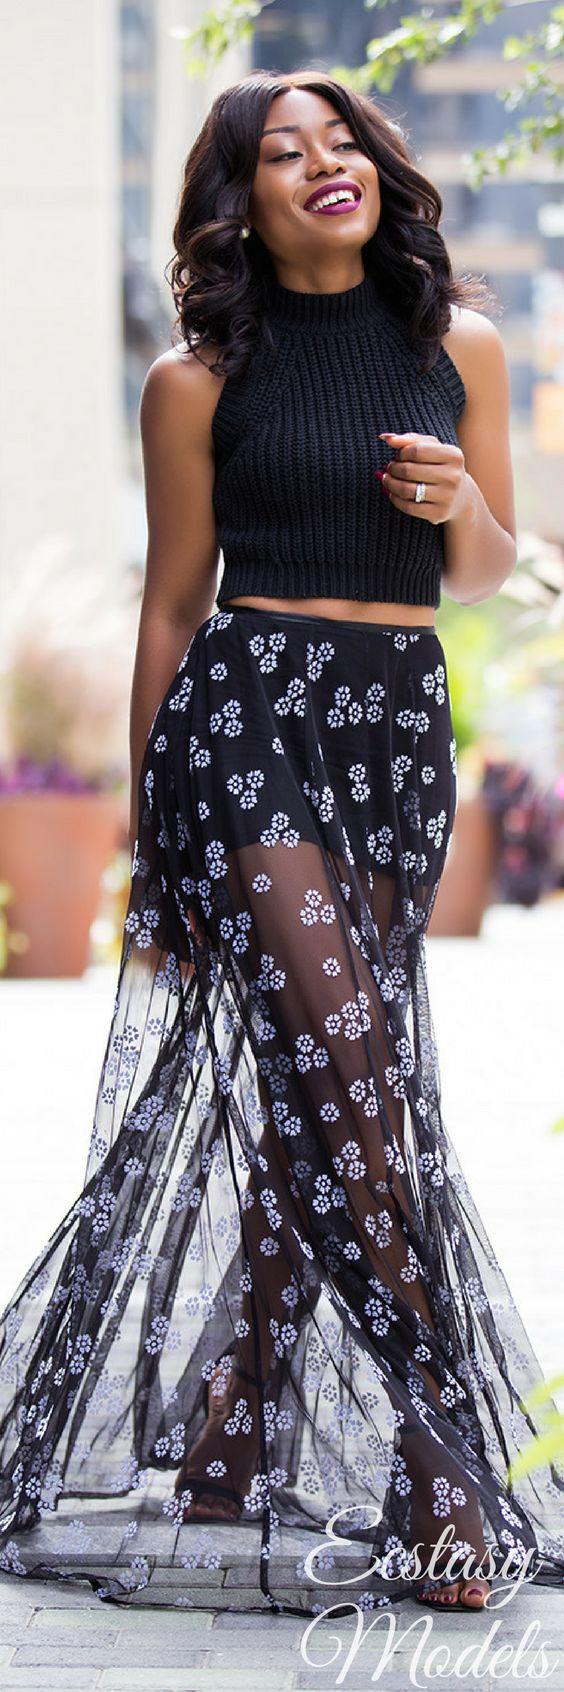 Maxi Sheer // Fashion Look by Jadore-Fashion